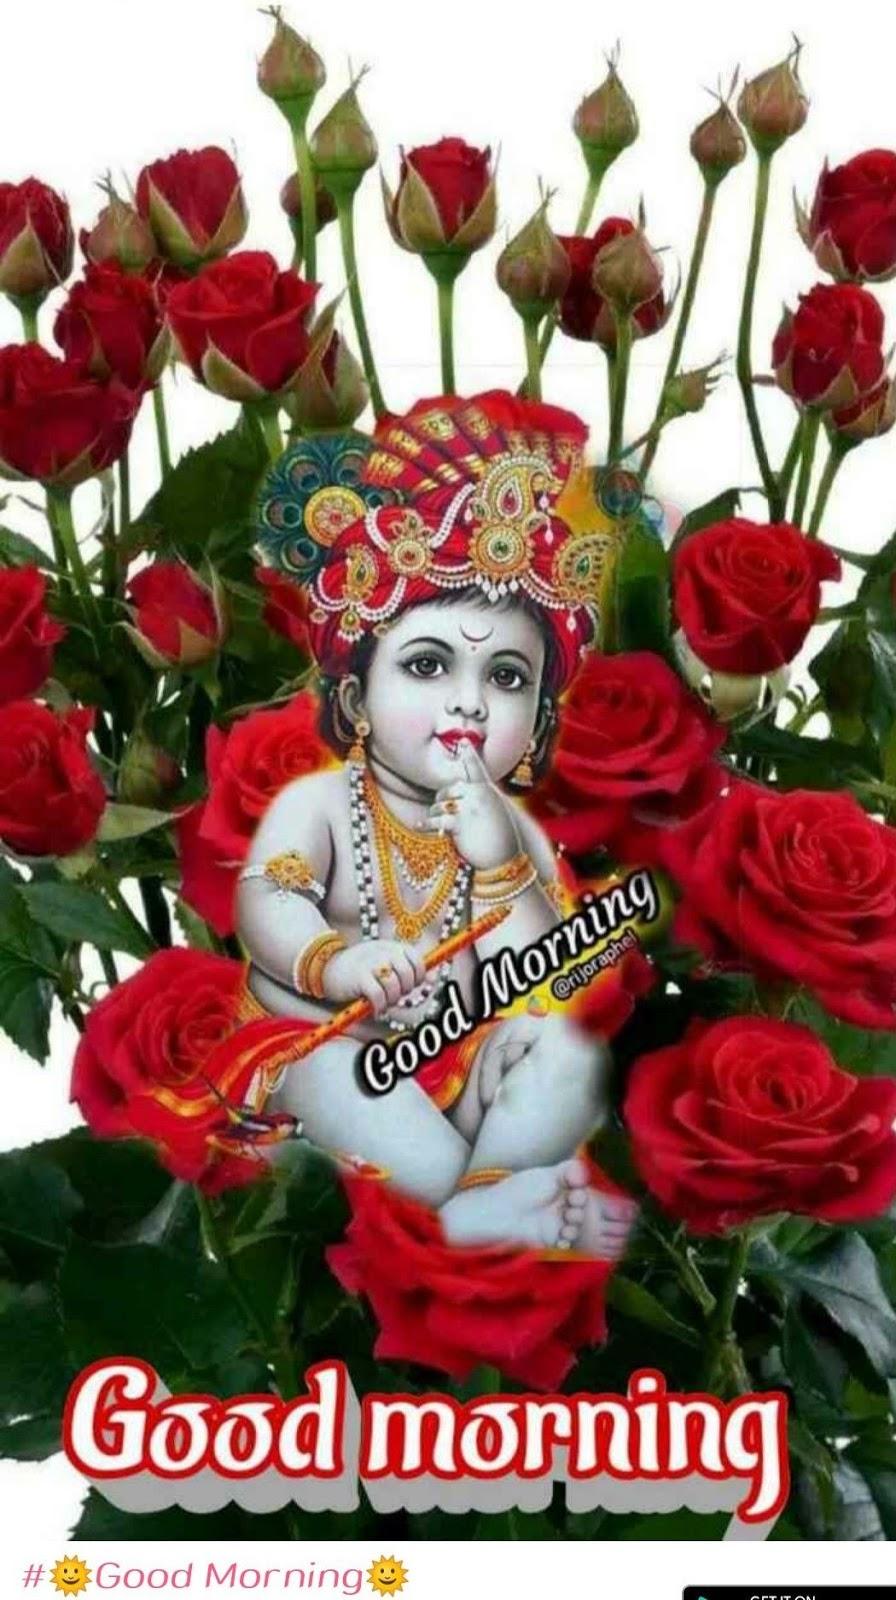 Good Morning Happy Krishna Janmashtami Wishes,